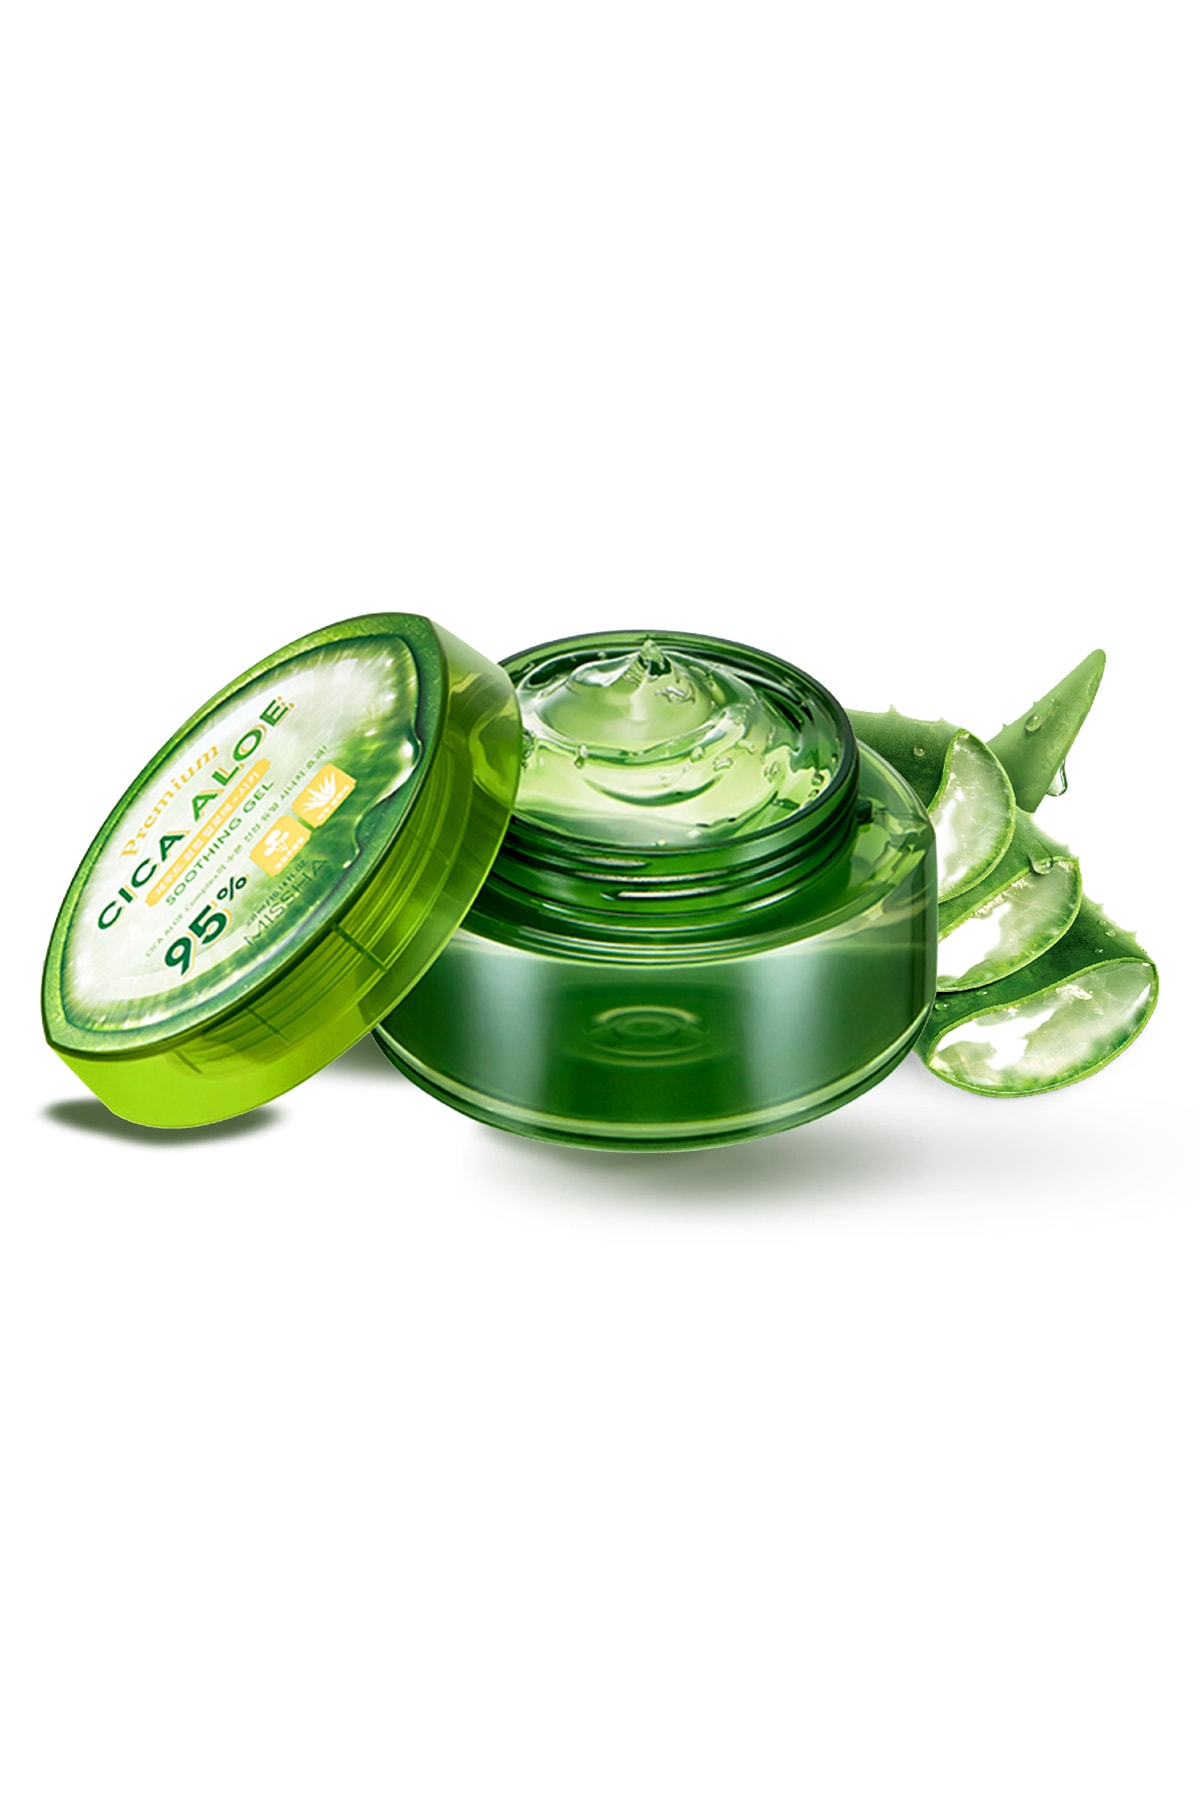 Missha %95 Cica Aloe Kompleksi İçeren Nemlendirici Jel 300ml Premium Cica Aloe Soothing Gel